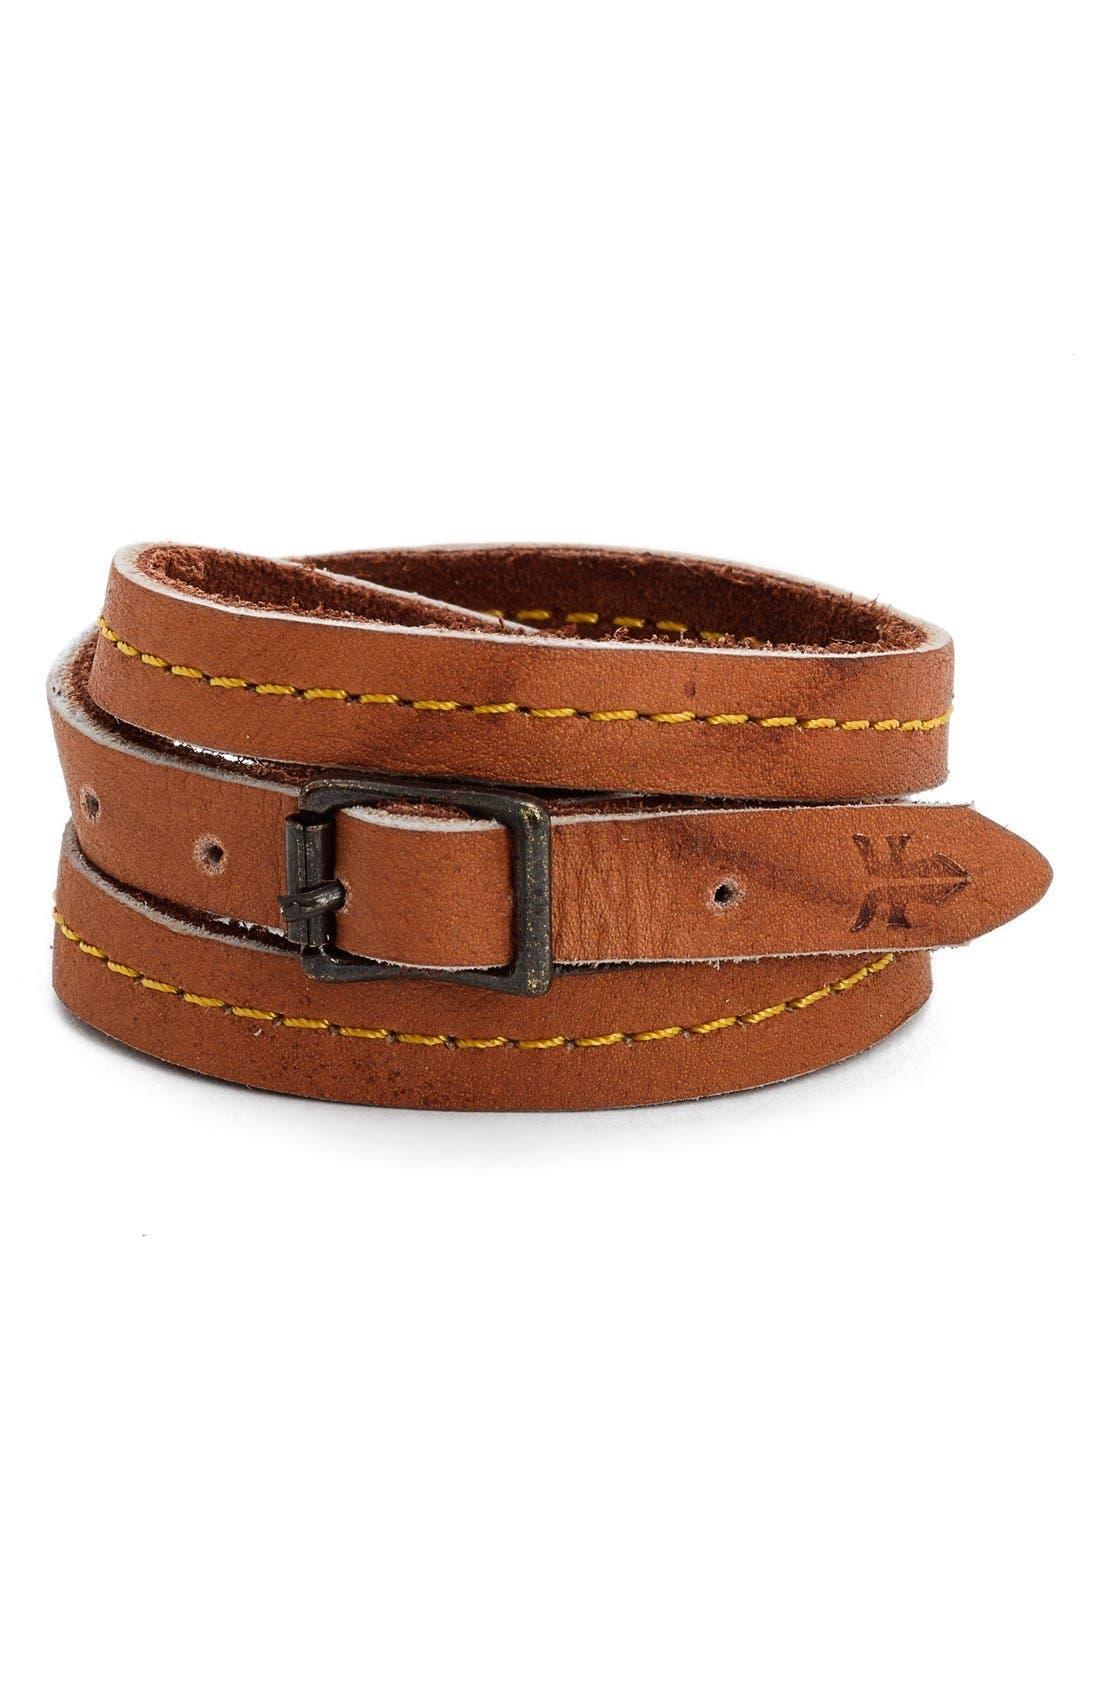 Alternate Image 1 Selected - Frye 'Campus' Leather Wrap Bracelet